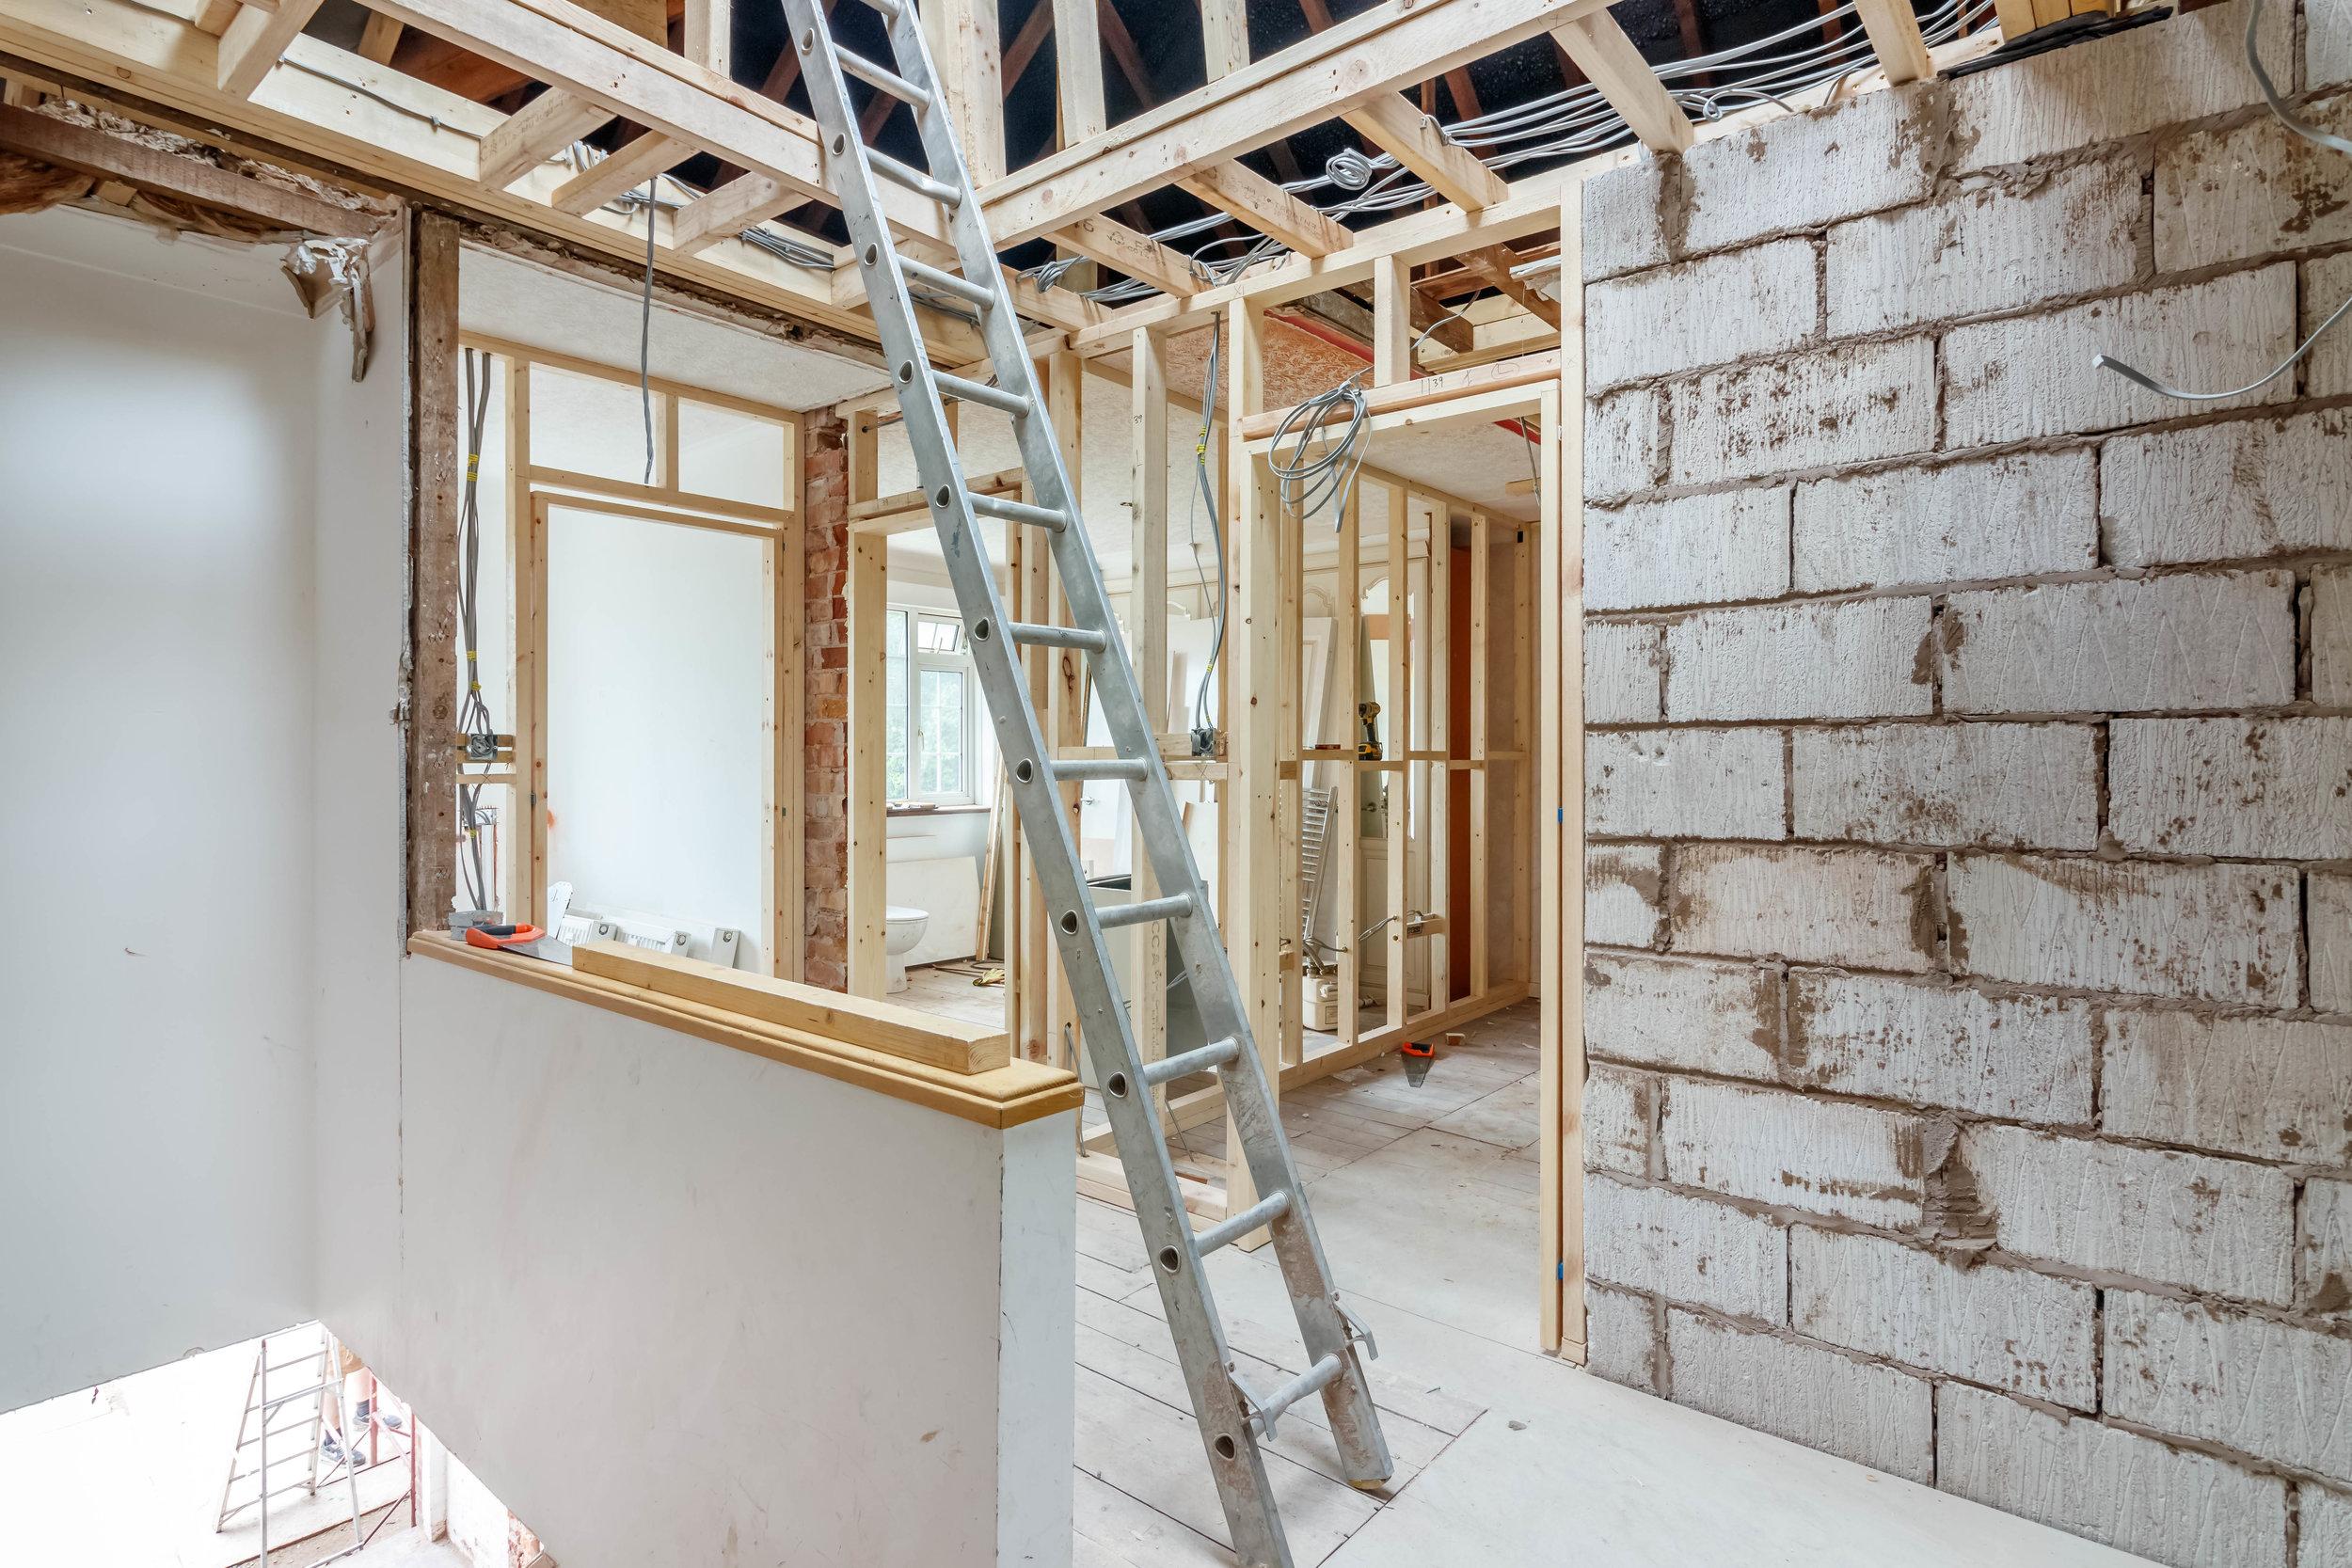 PropertyPhotographs 05173.jpg